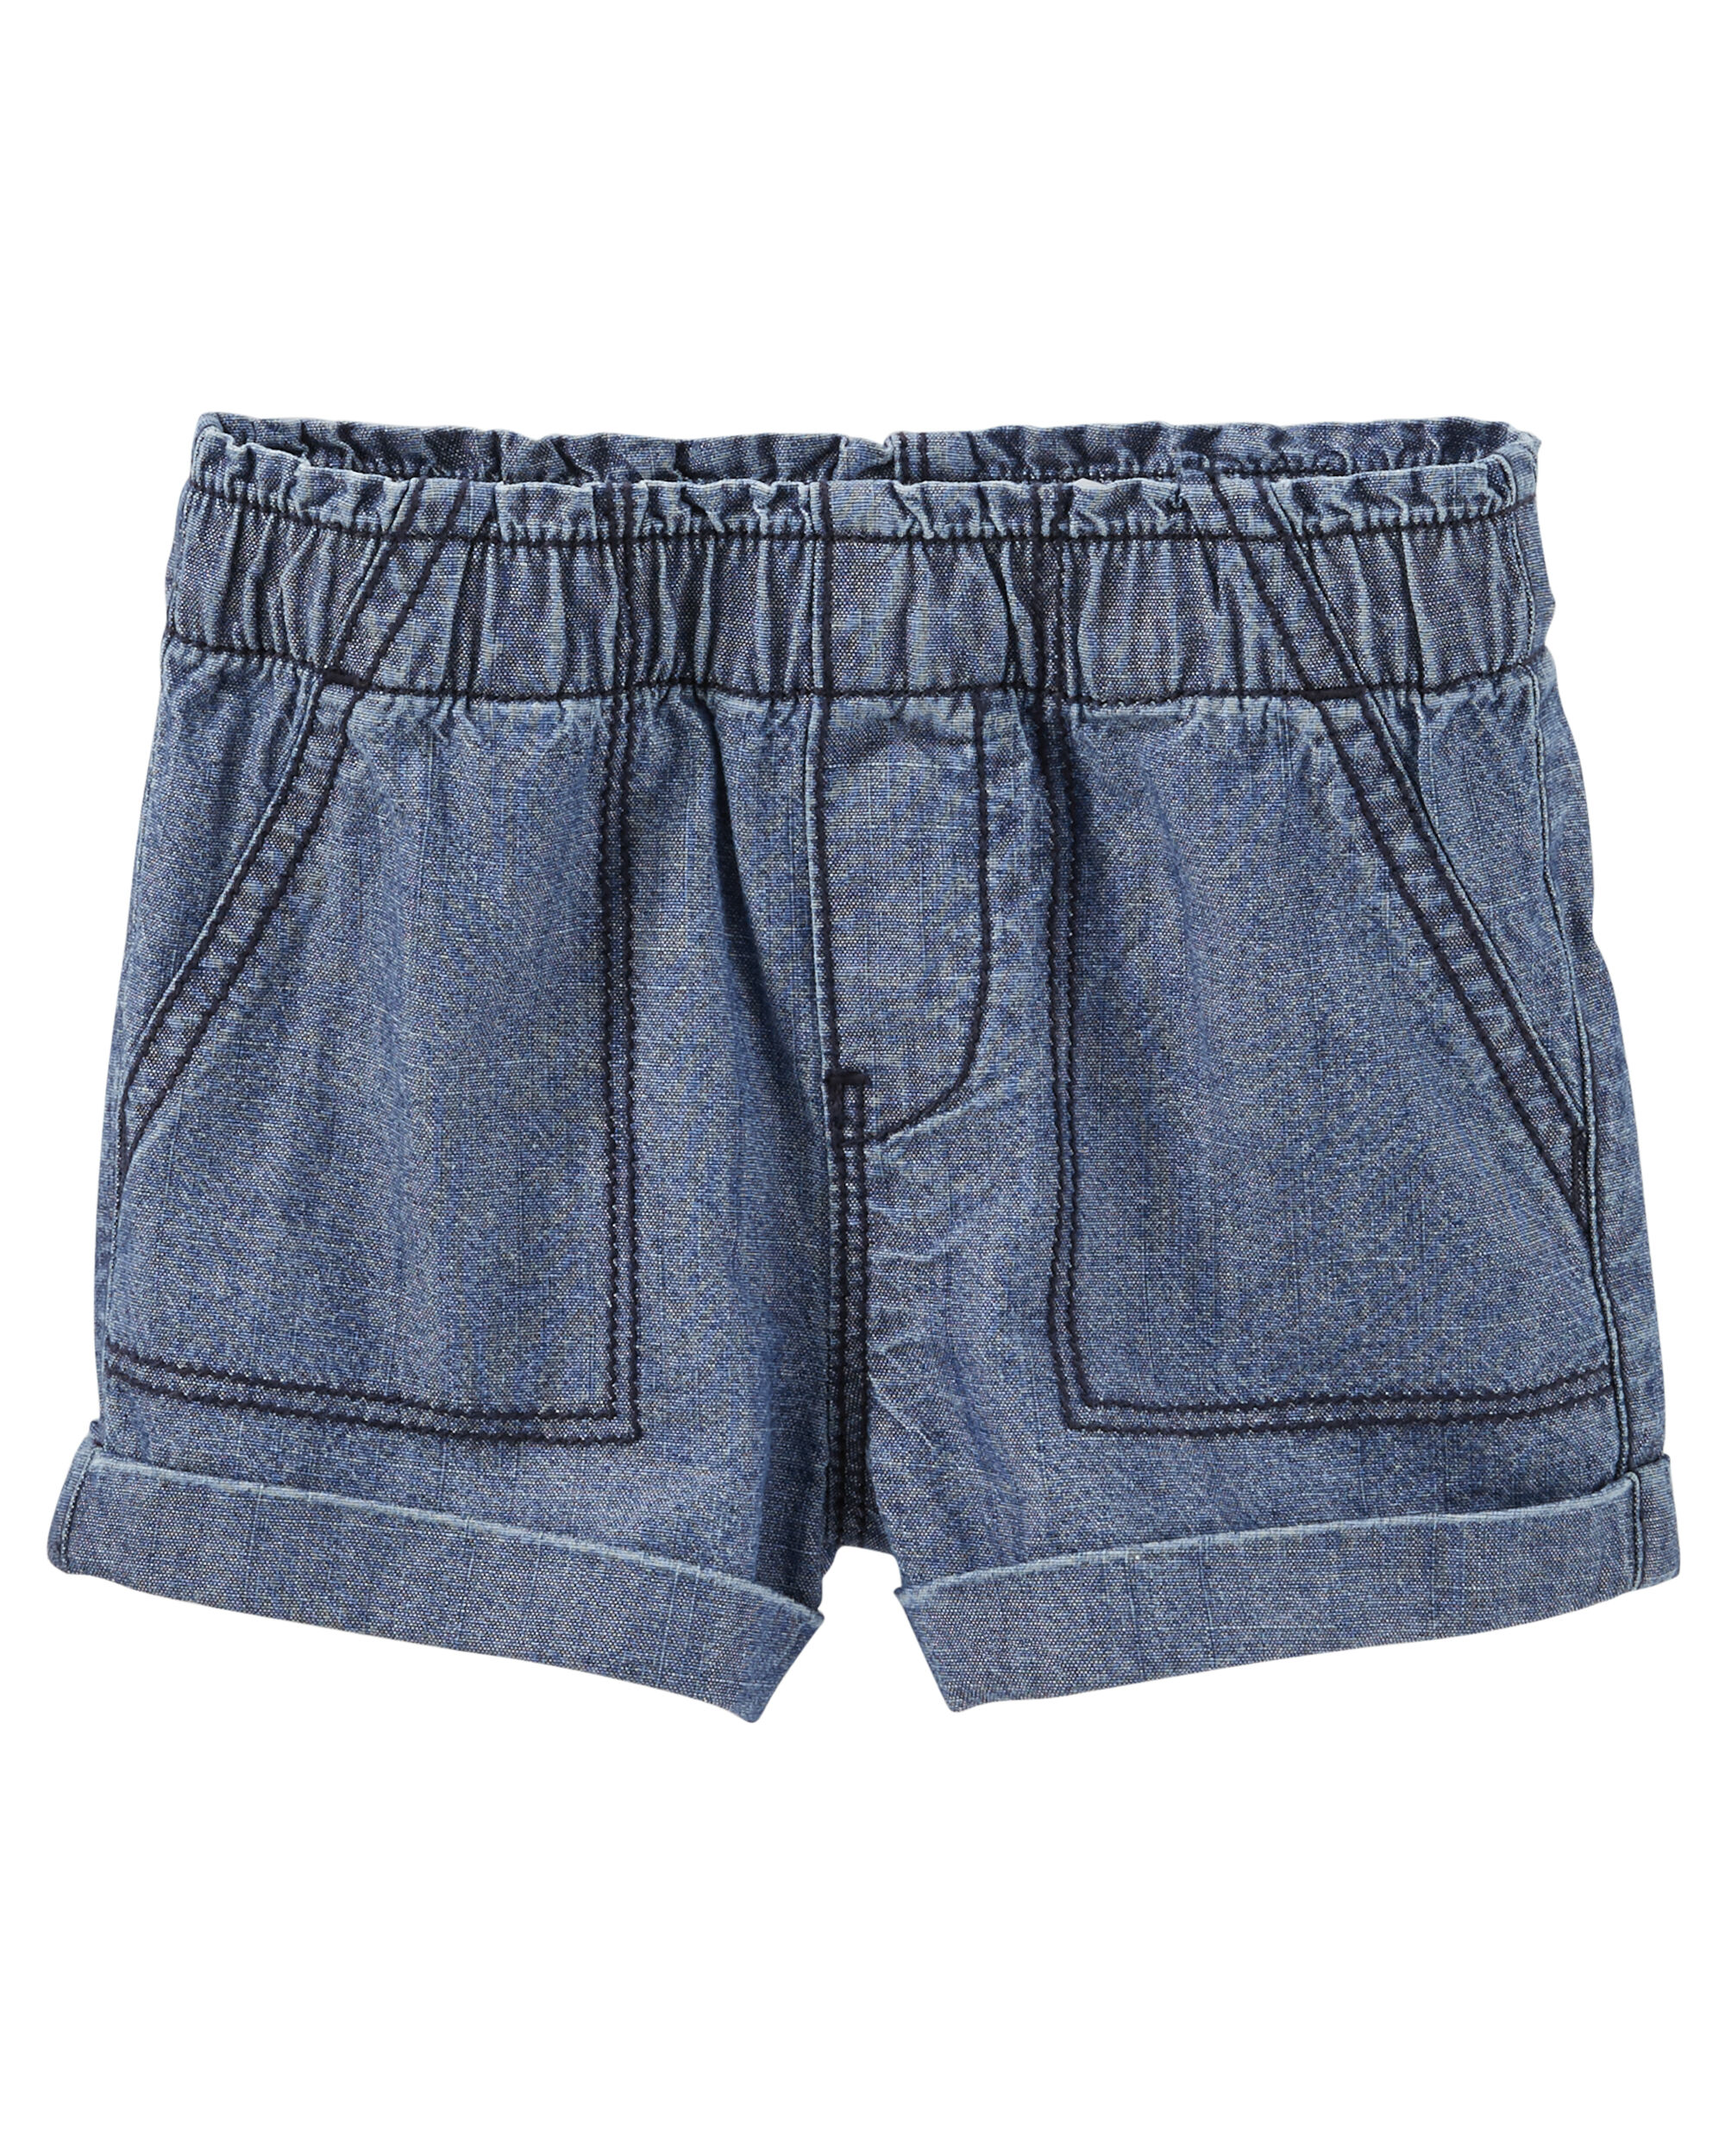 Pull-On Chambray Shorts